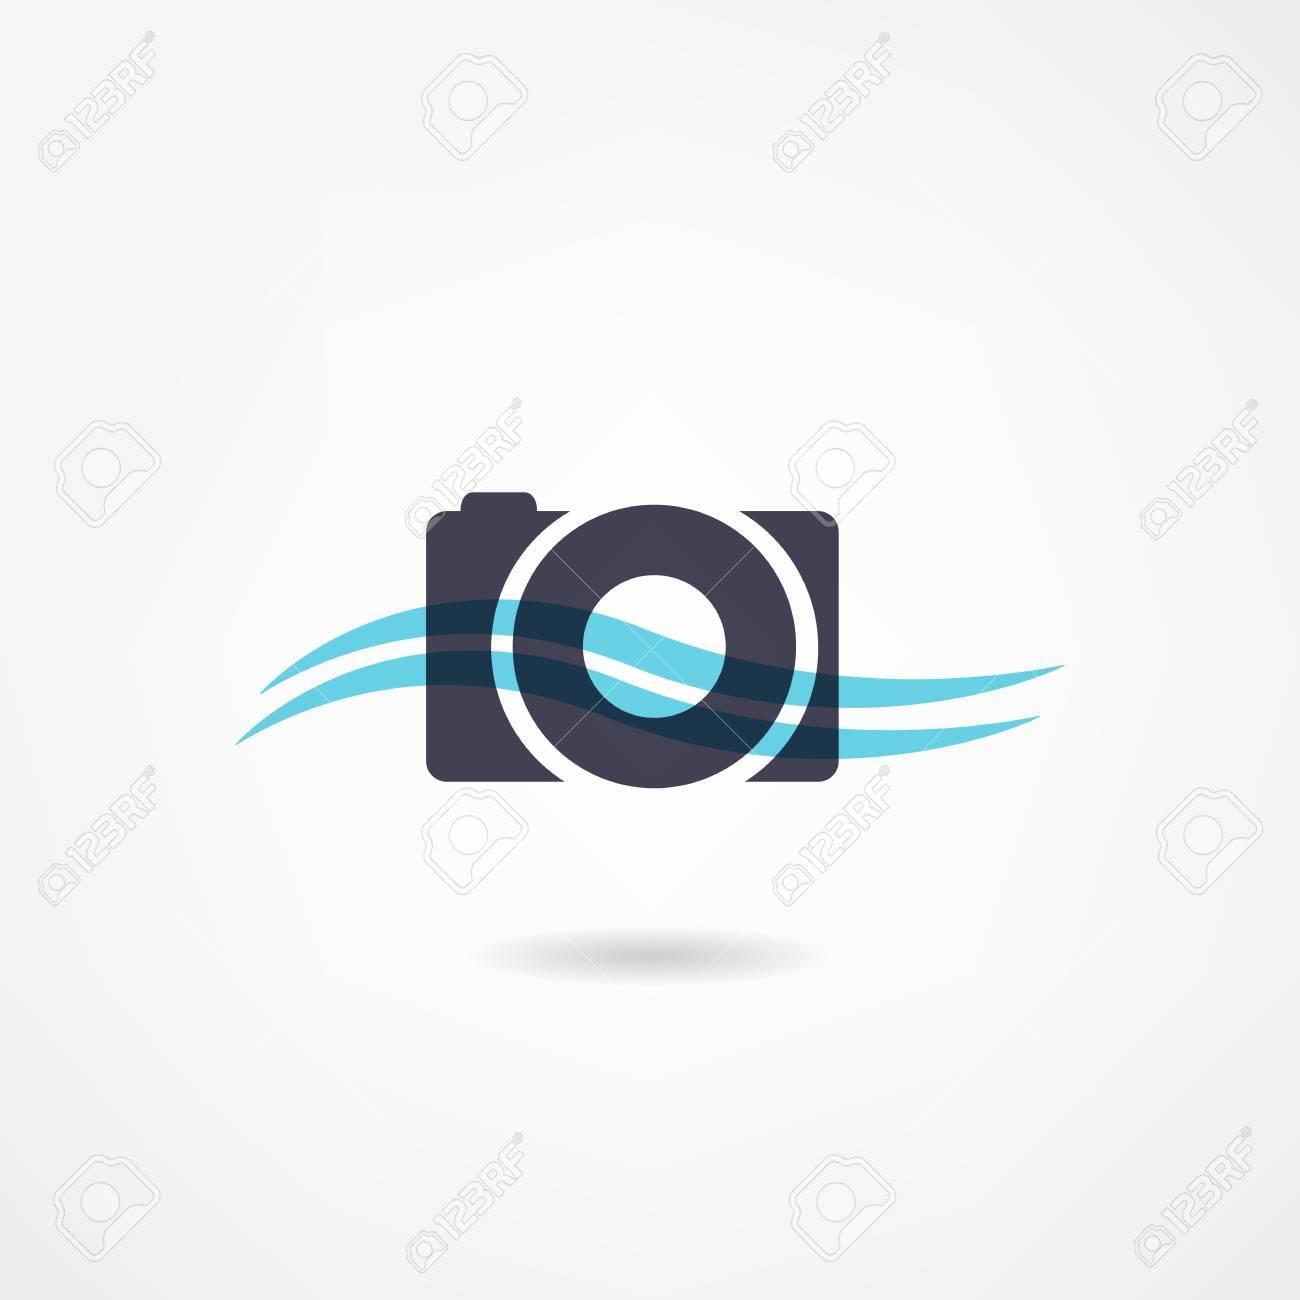 photo icon Stock Vector - 21602391